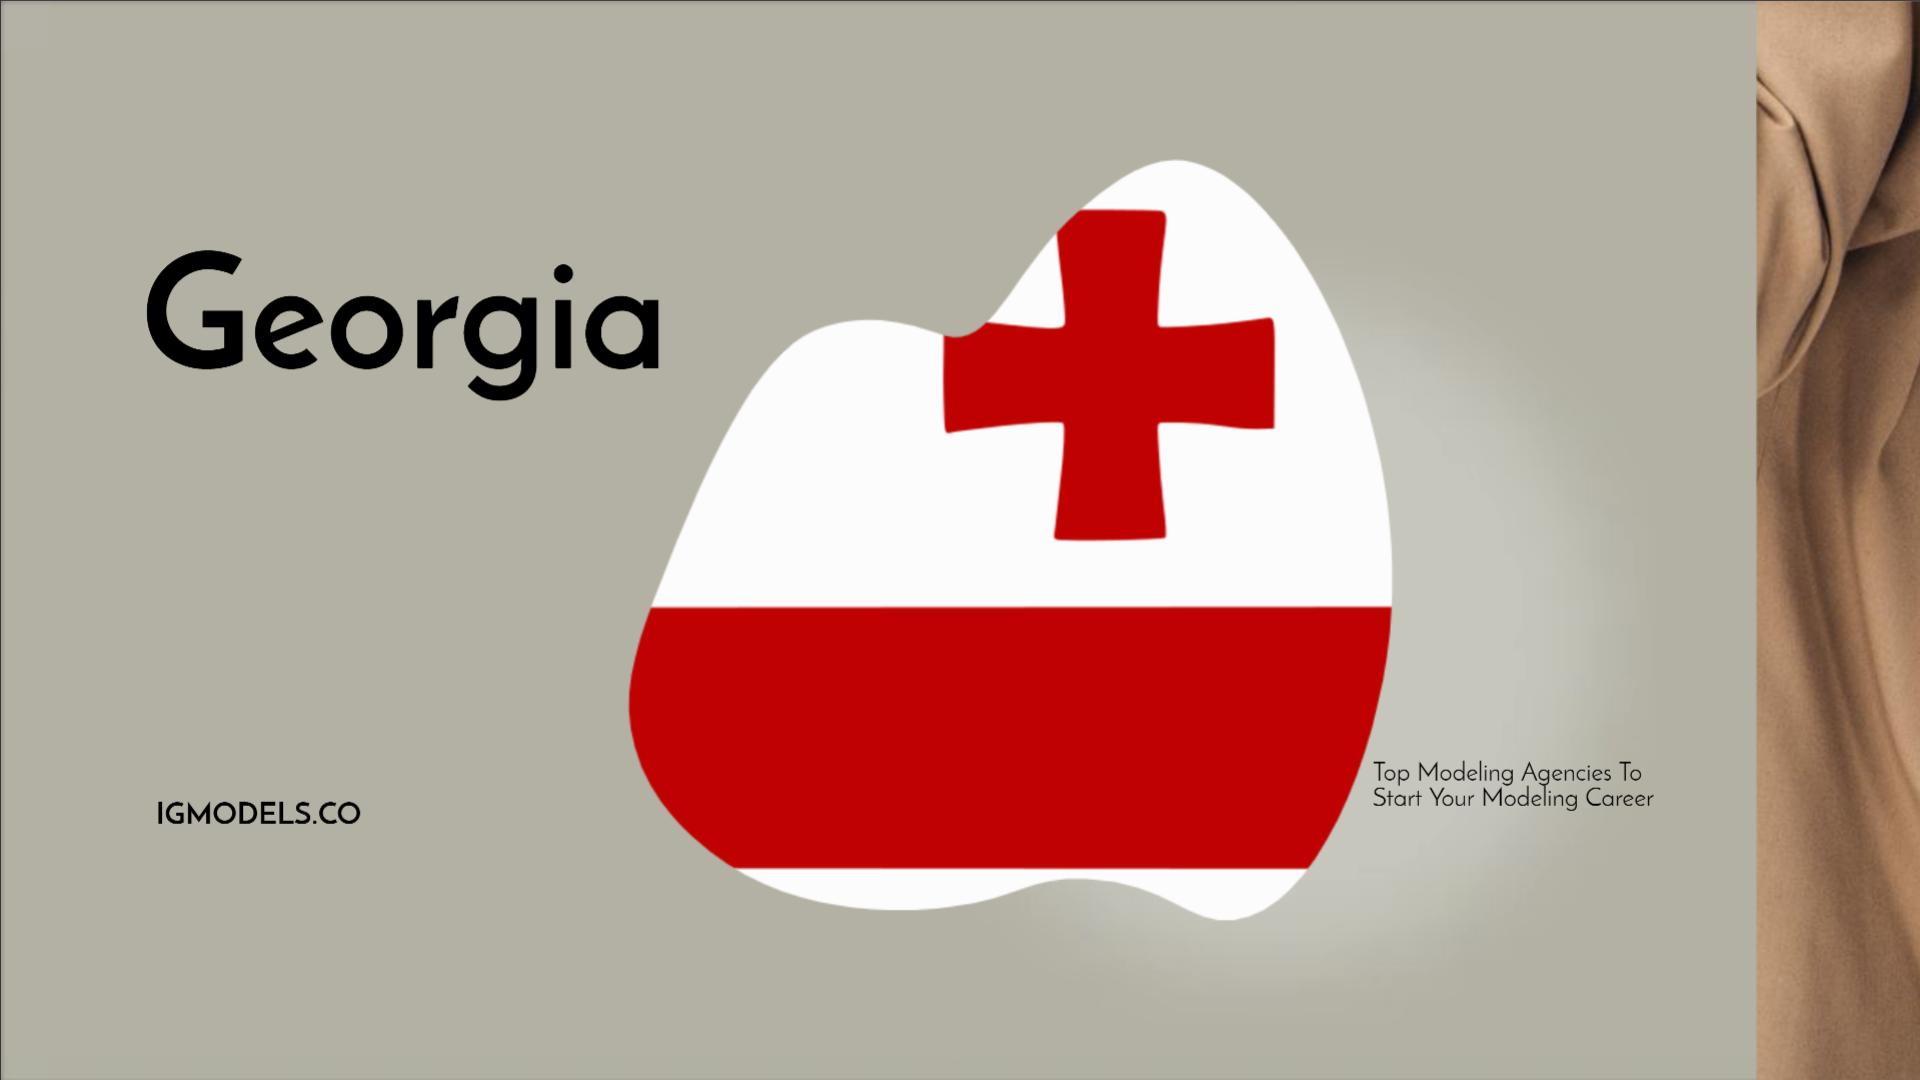 List : Top 35 Modeling Agencies In Georgia To Start Your Modeling Career In 2021